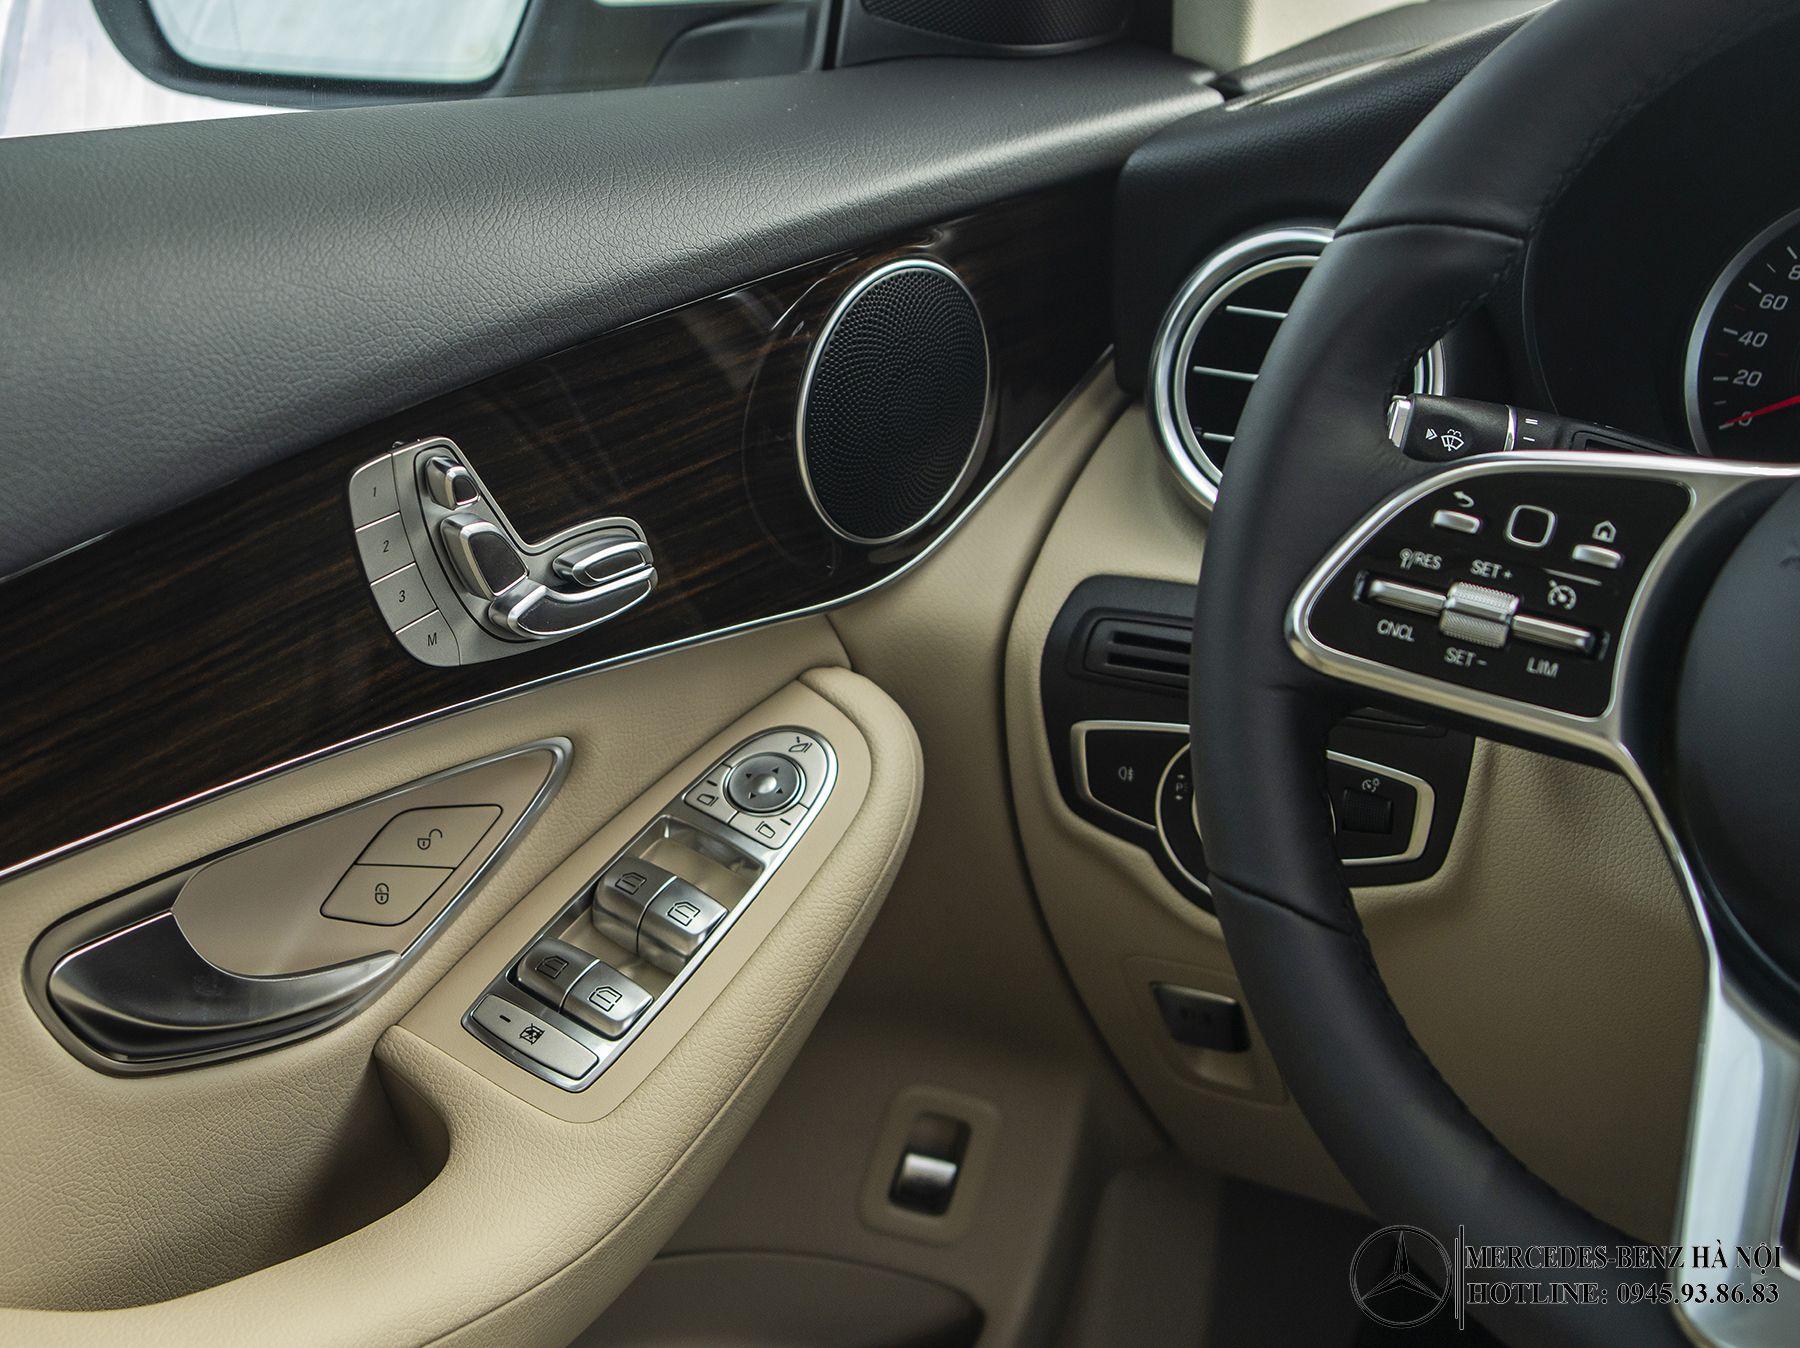 dieu-khien-cua-lai-noi-that-Mercedes-Benz-GLC-200-2020_mercedeshanoi-com-vn